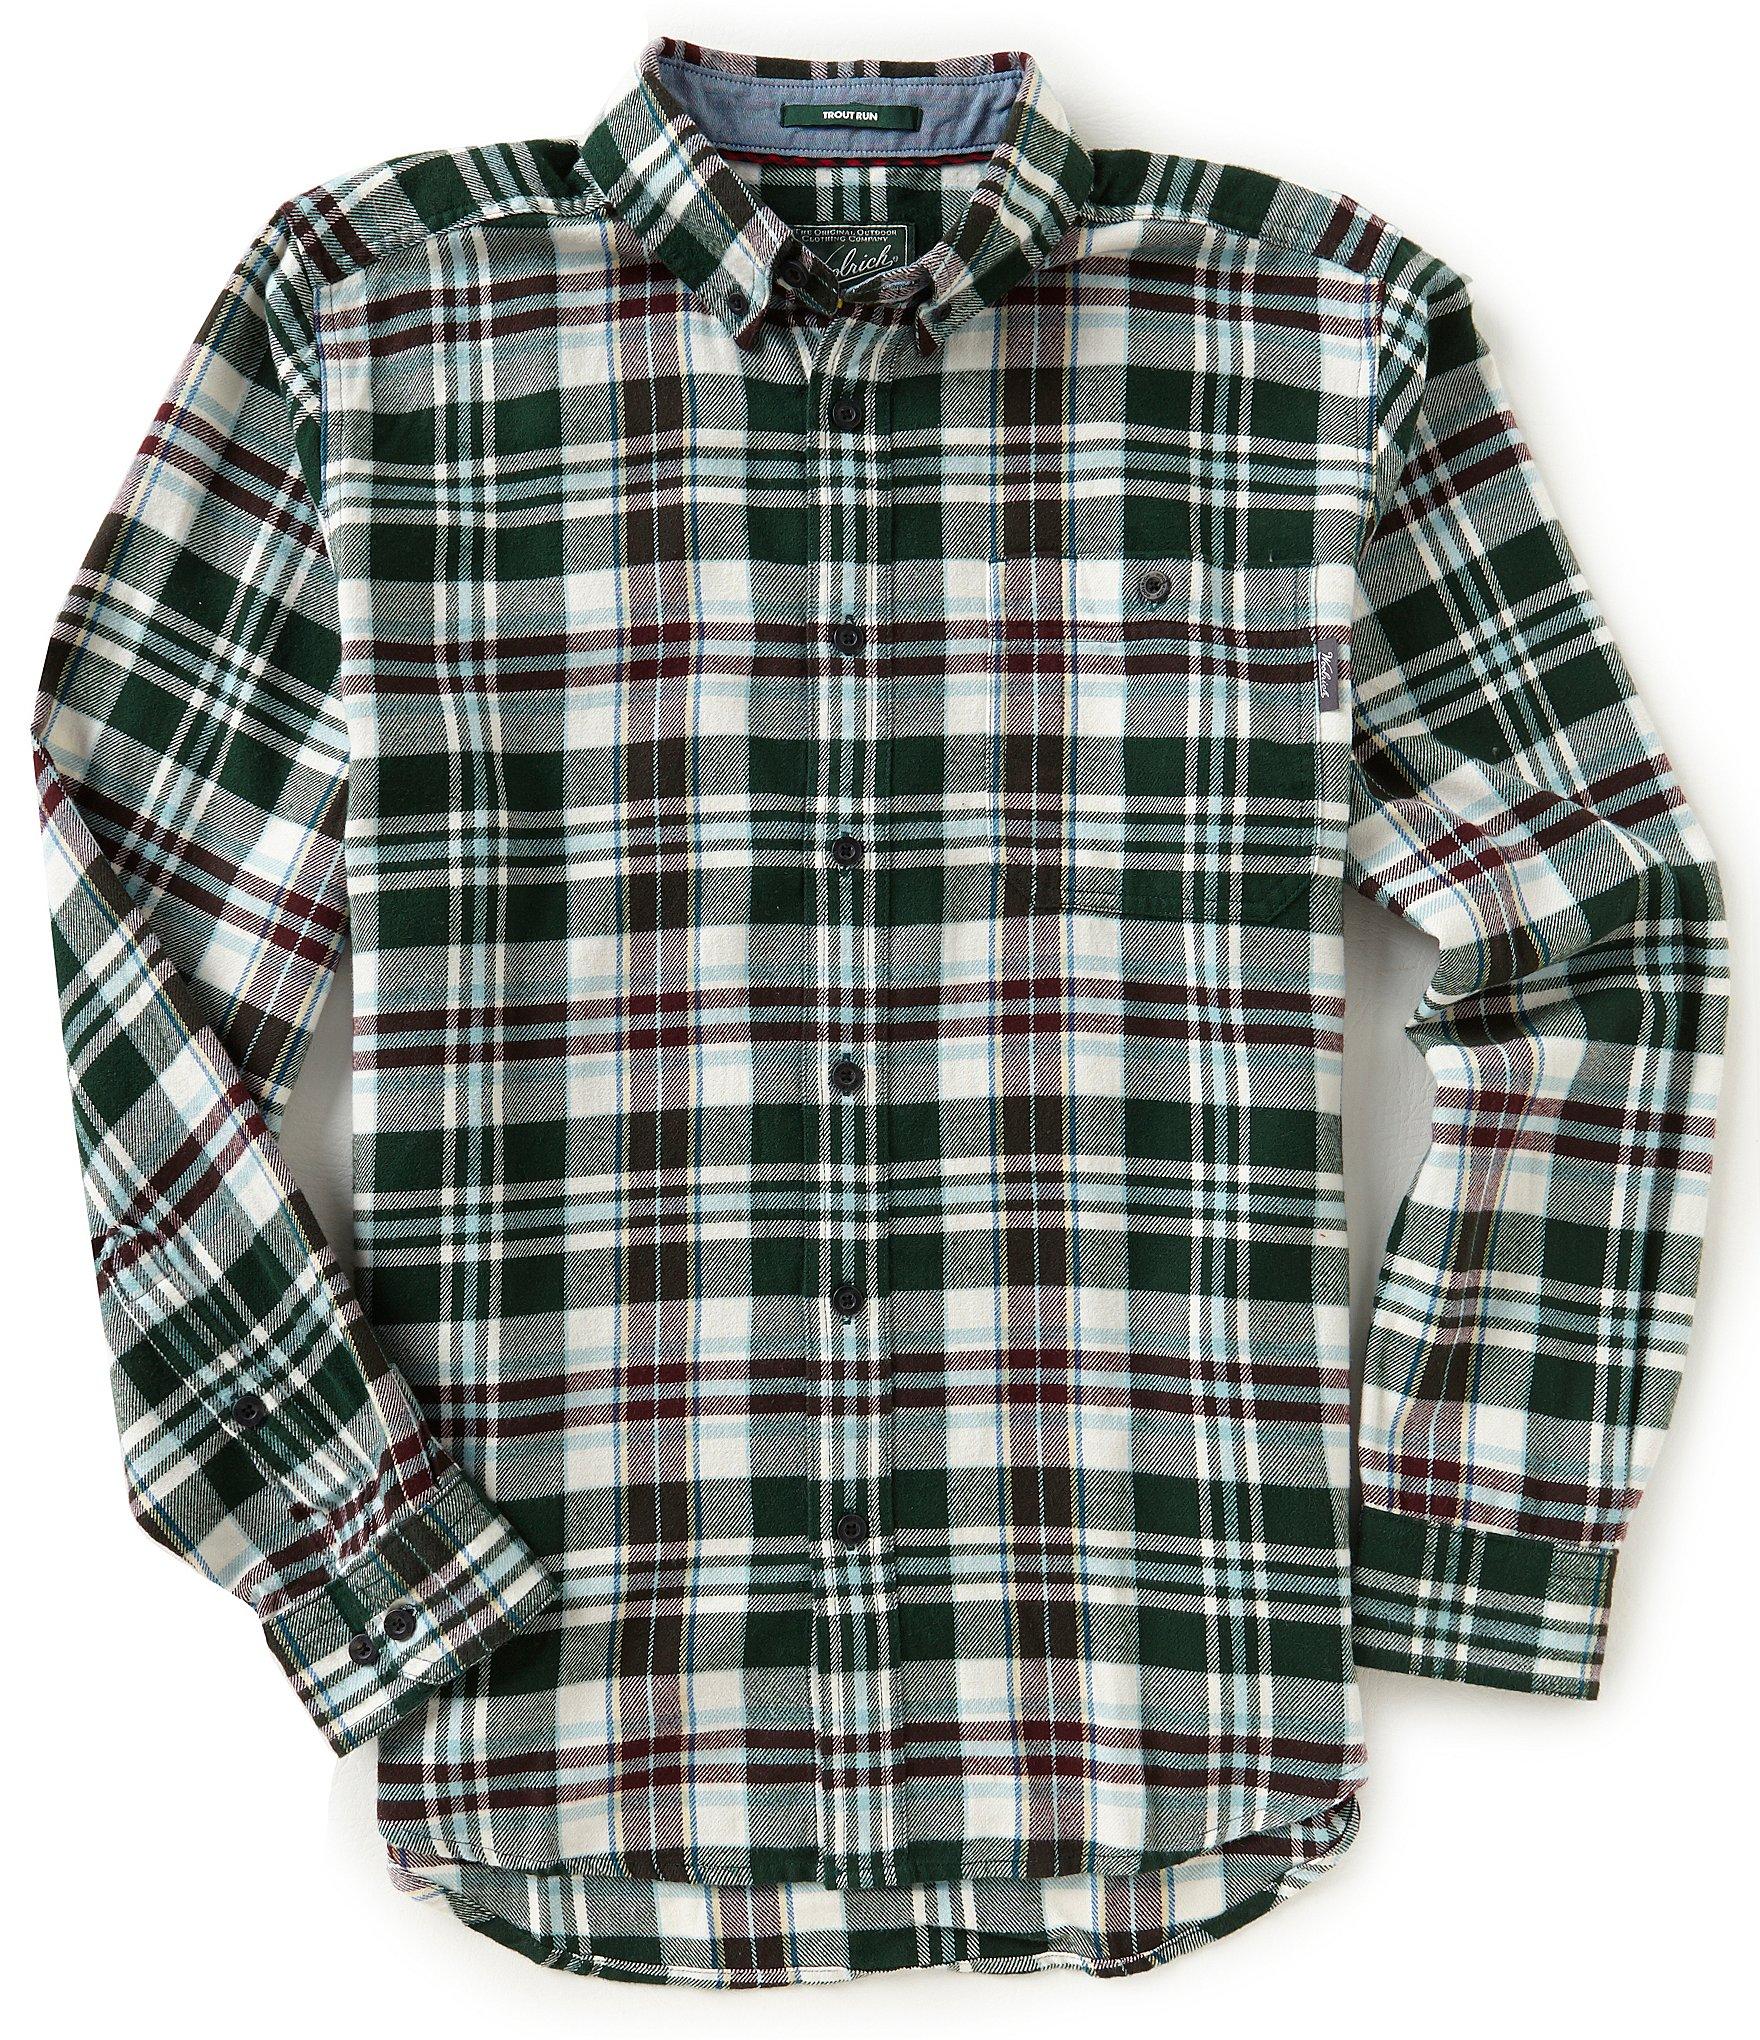 Woolrich Trout Run Long Sleeve Plaid Flannel Shirt Dillards